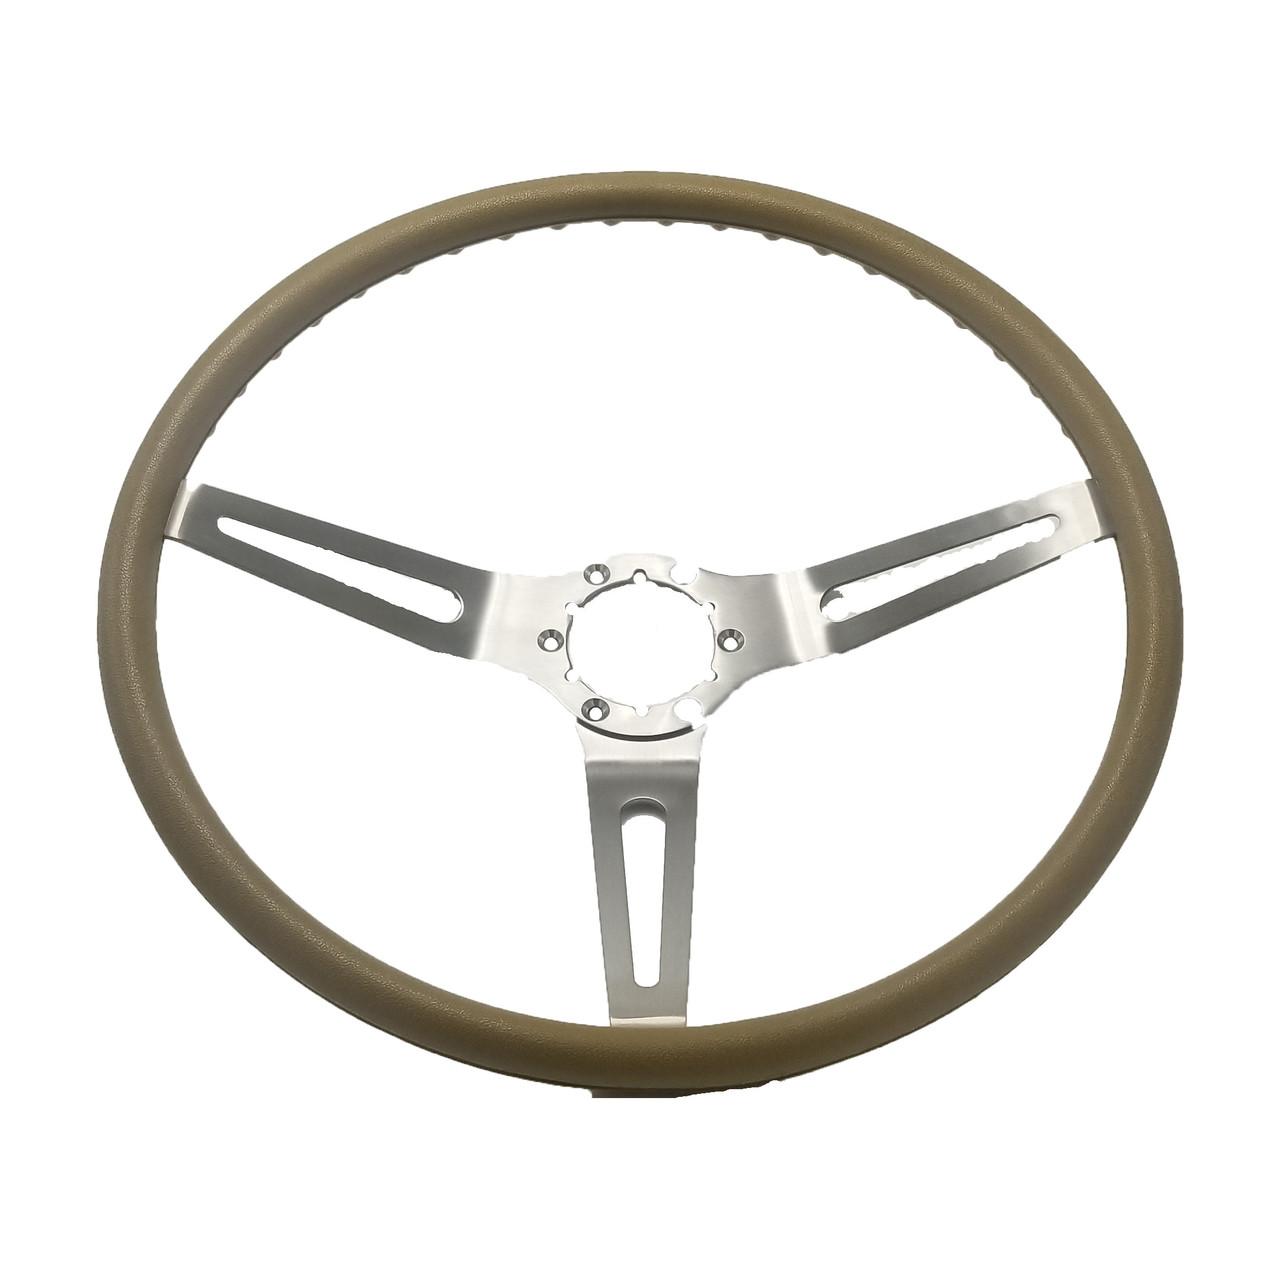 1970 Saddle  3-Spoke Steering Wheel (complete)